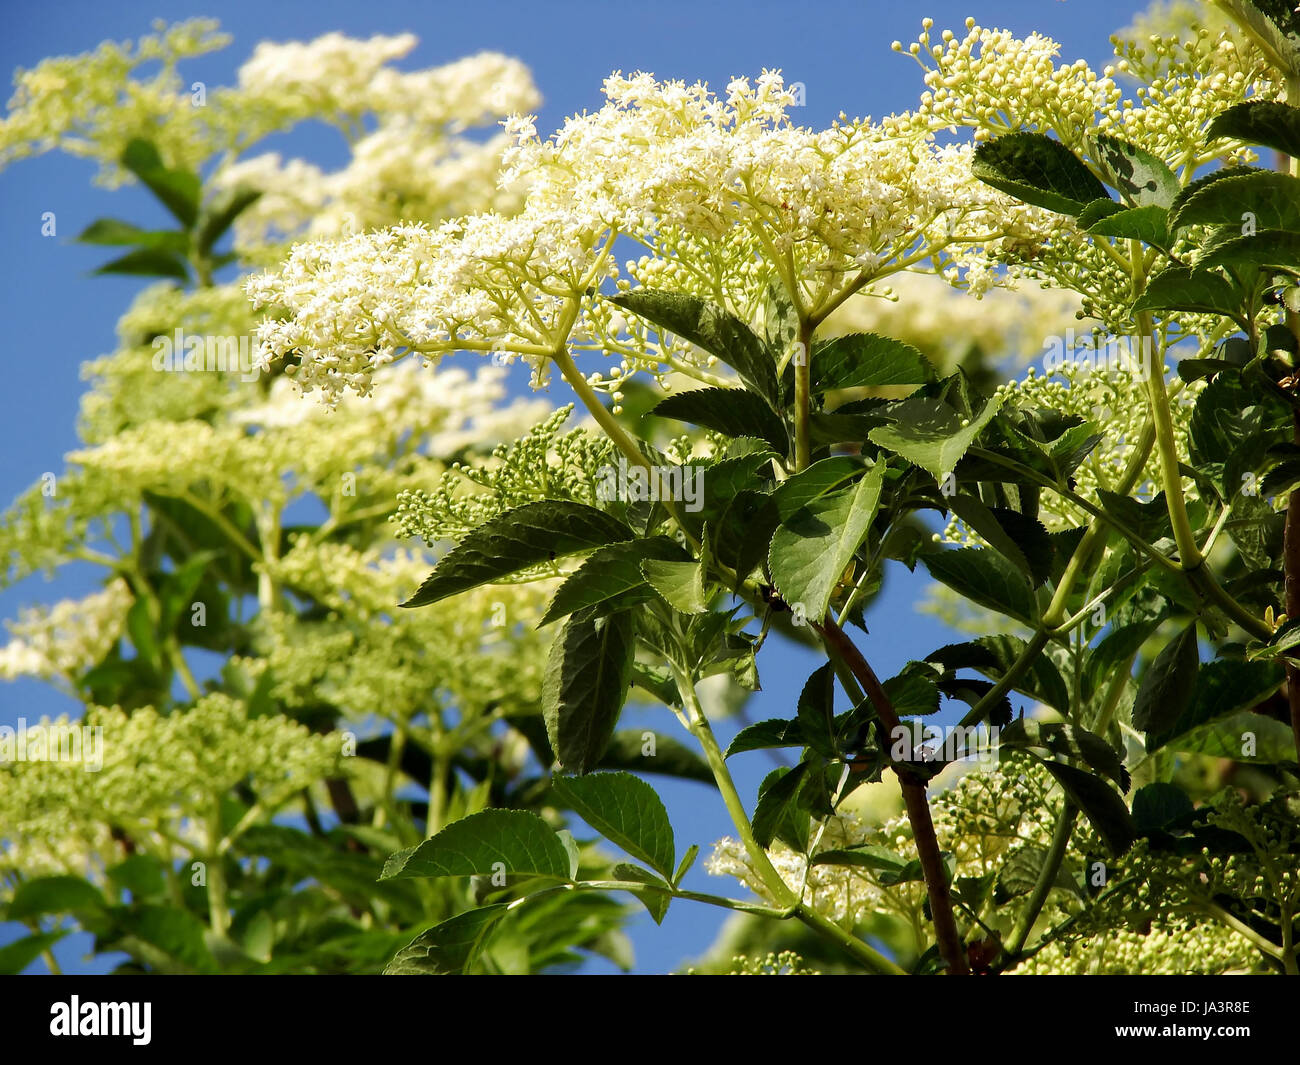 bloom, blossom, flourish, flourishing, bush, homeopathy, season, naturopathy, Stock Photo